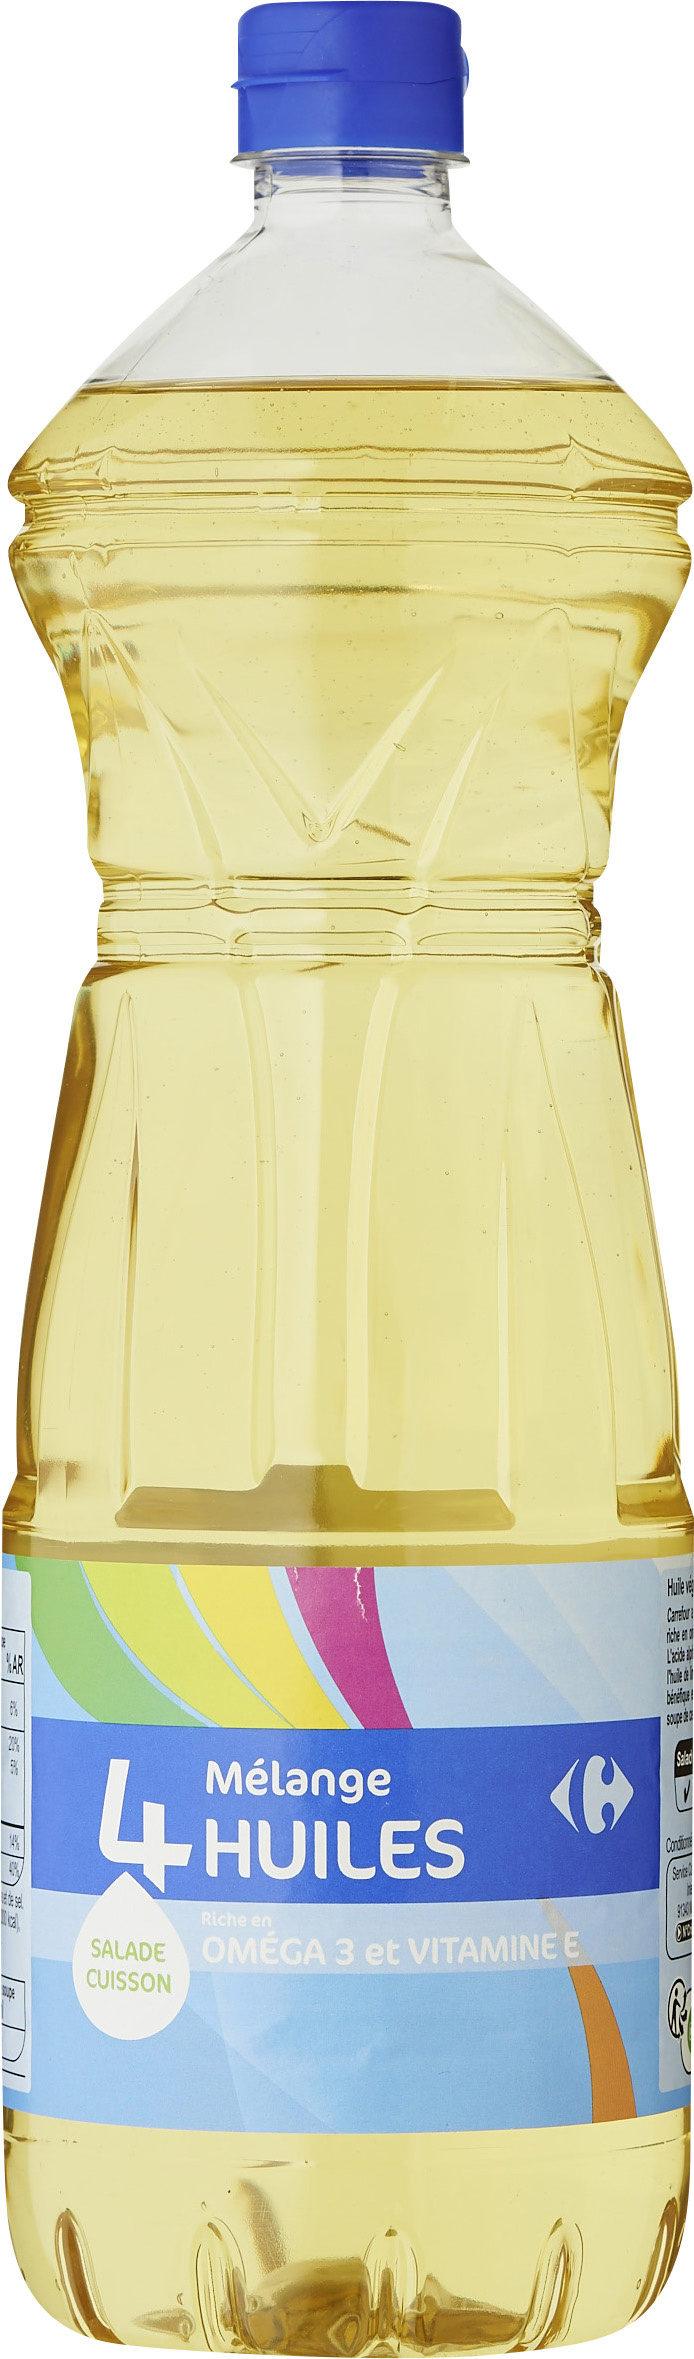 Mélange 4 huiles - Product - fr